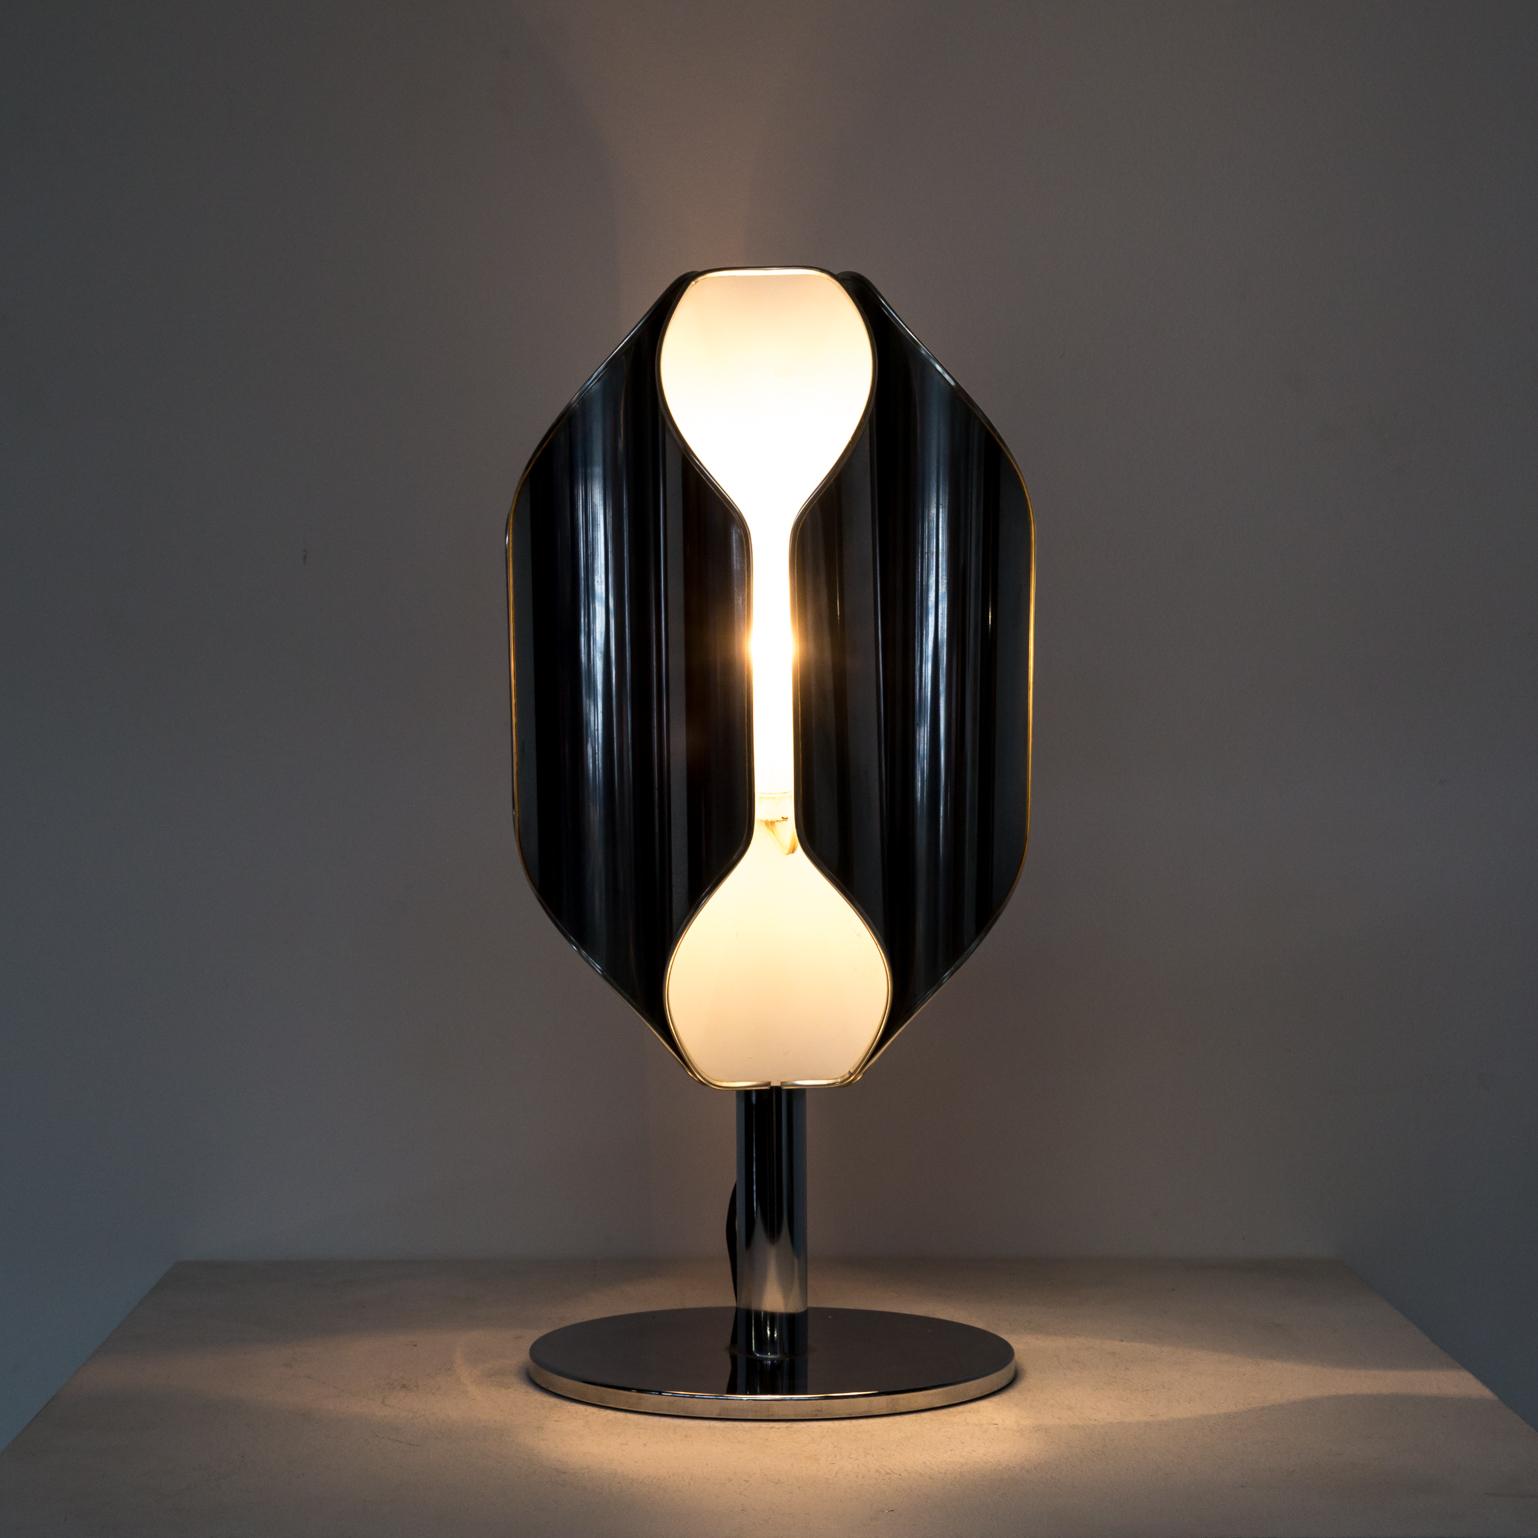 60s Beautiful Shaped Goffredo Reggiani Table Lamp BarbMama